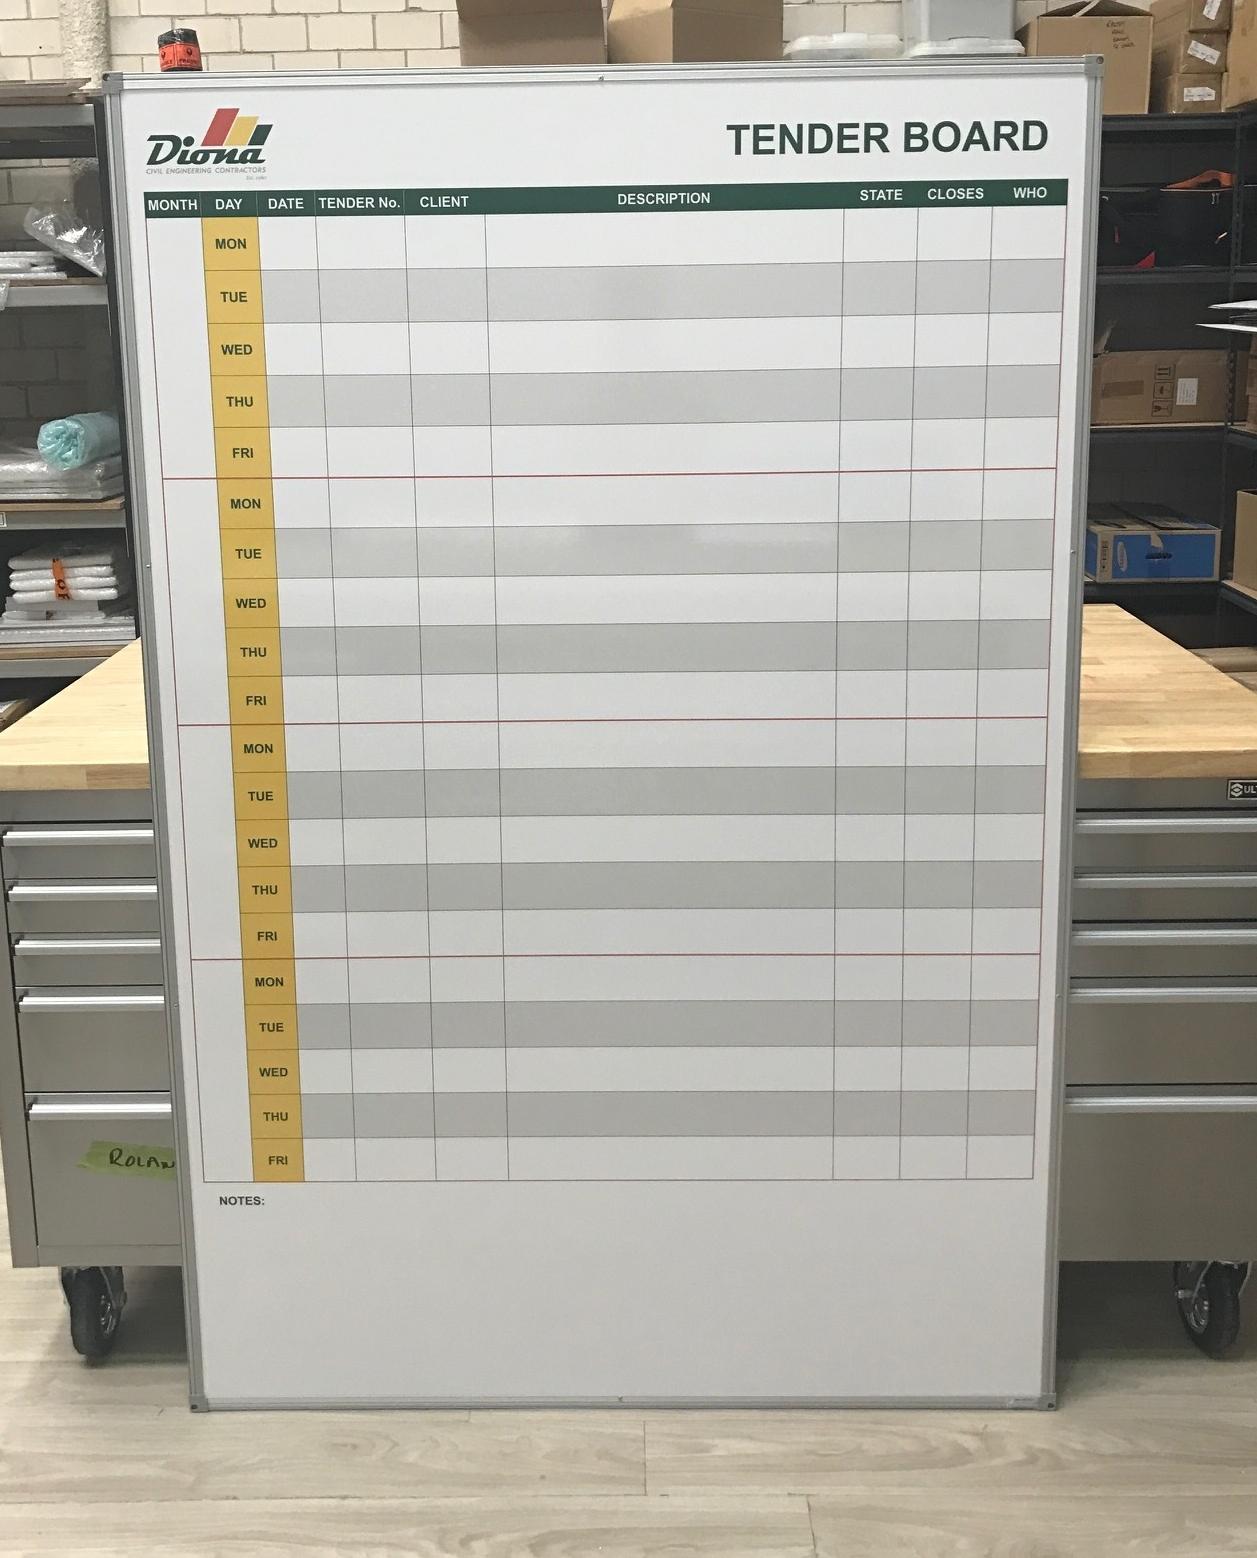 Diona Tender Board